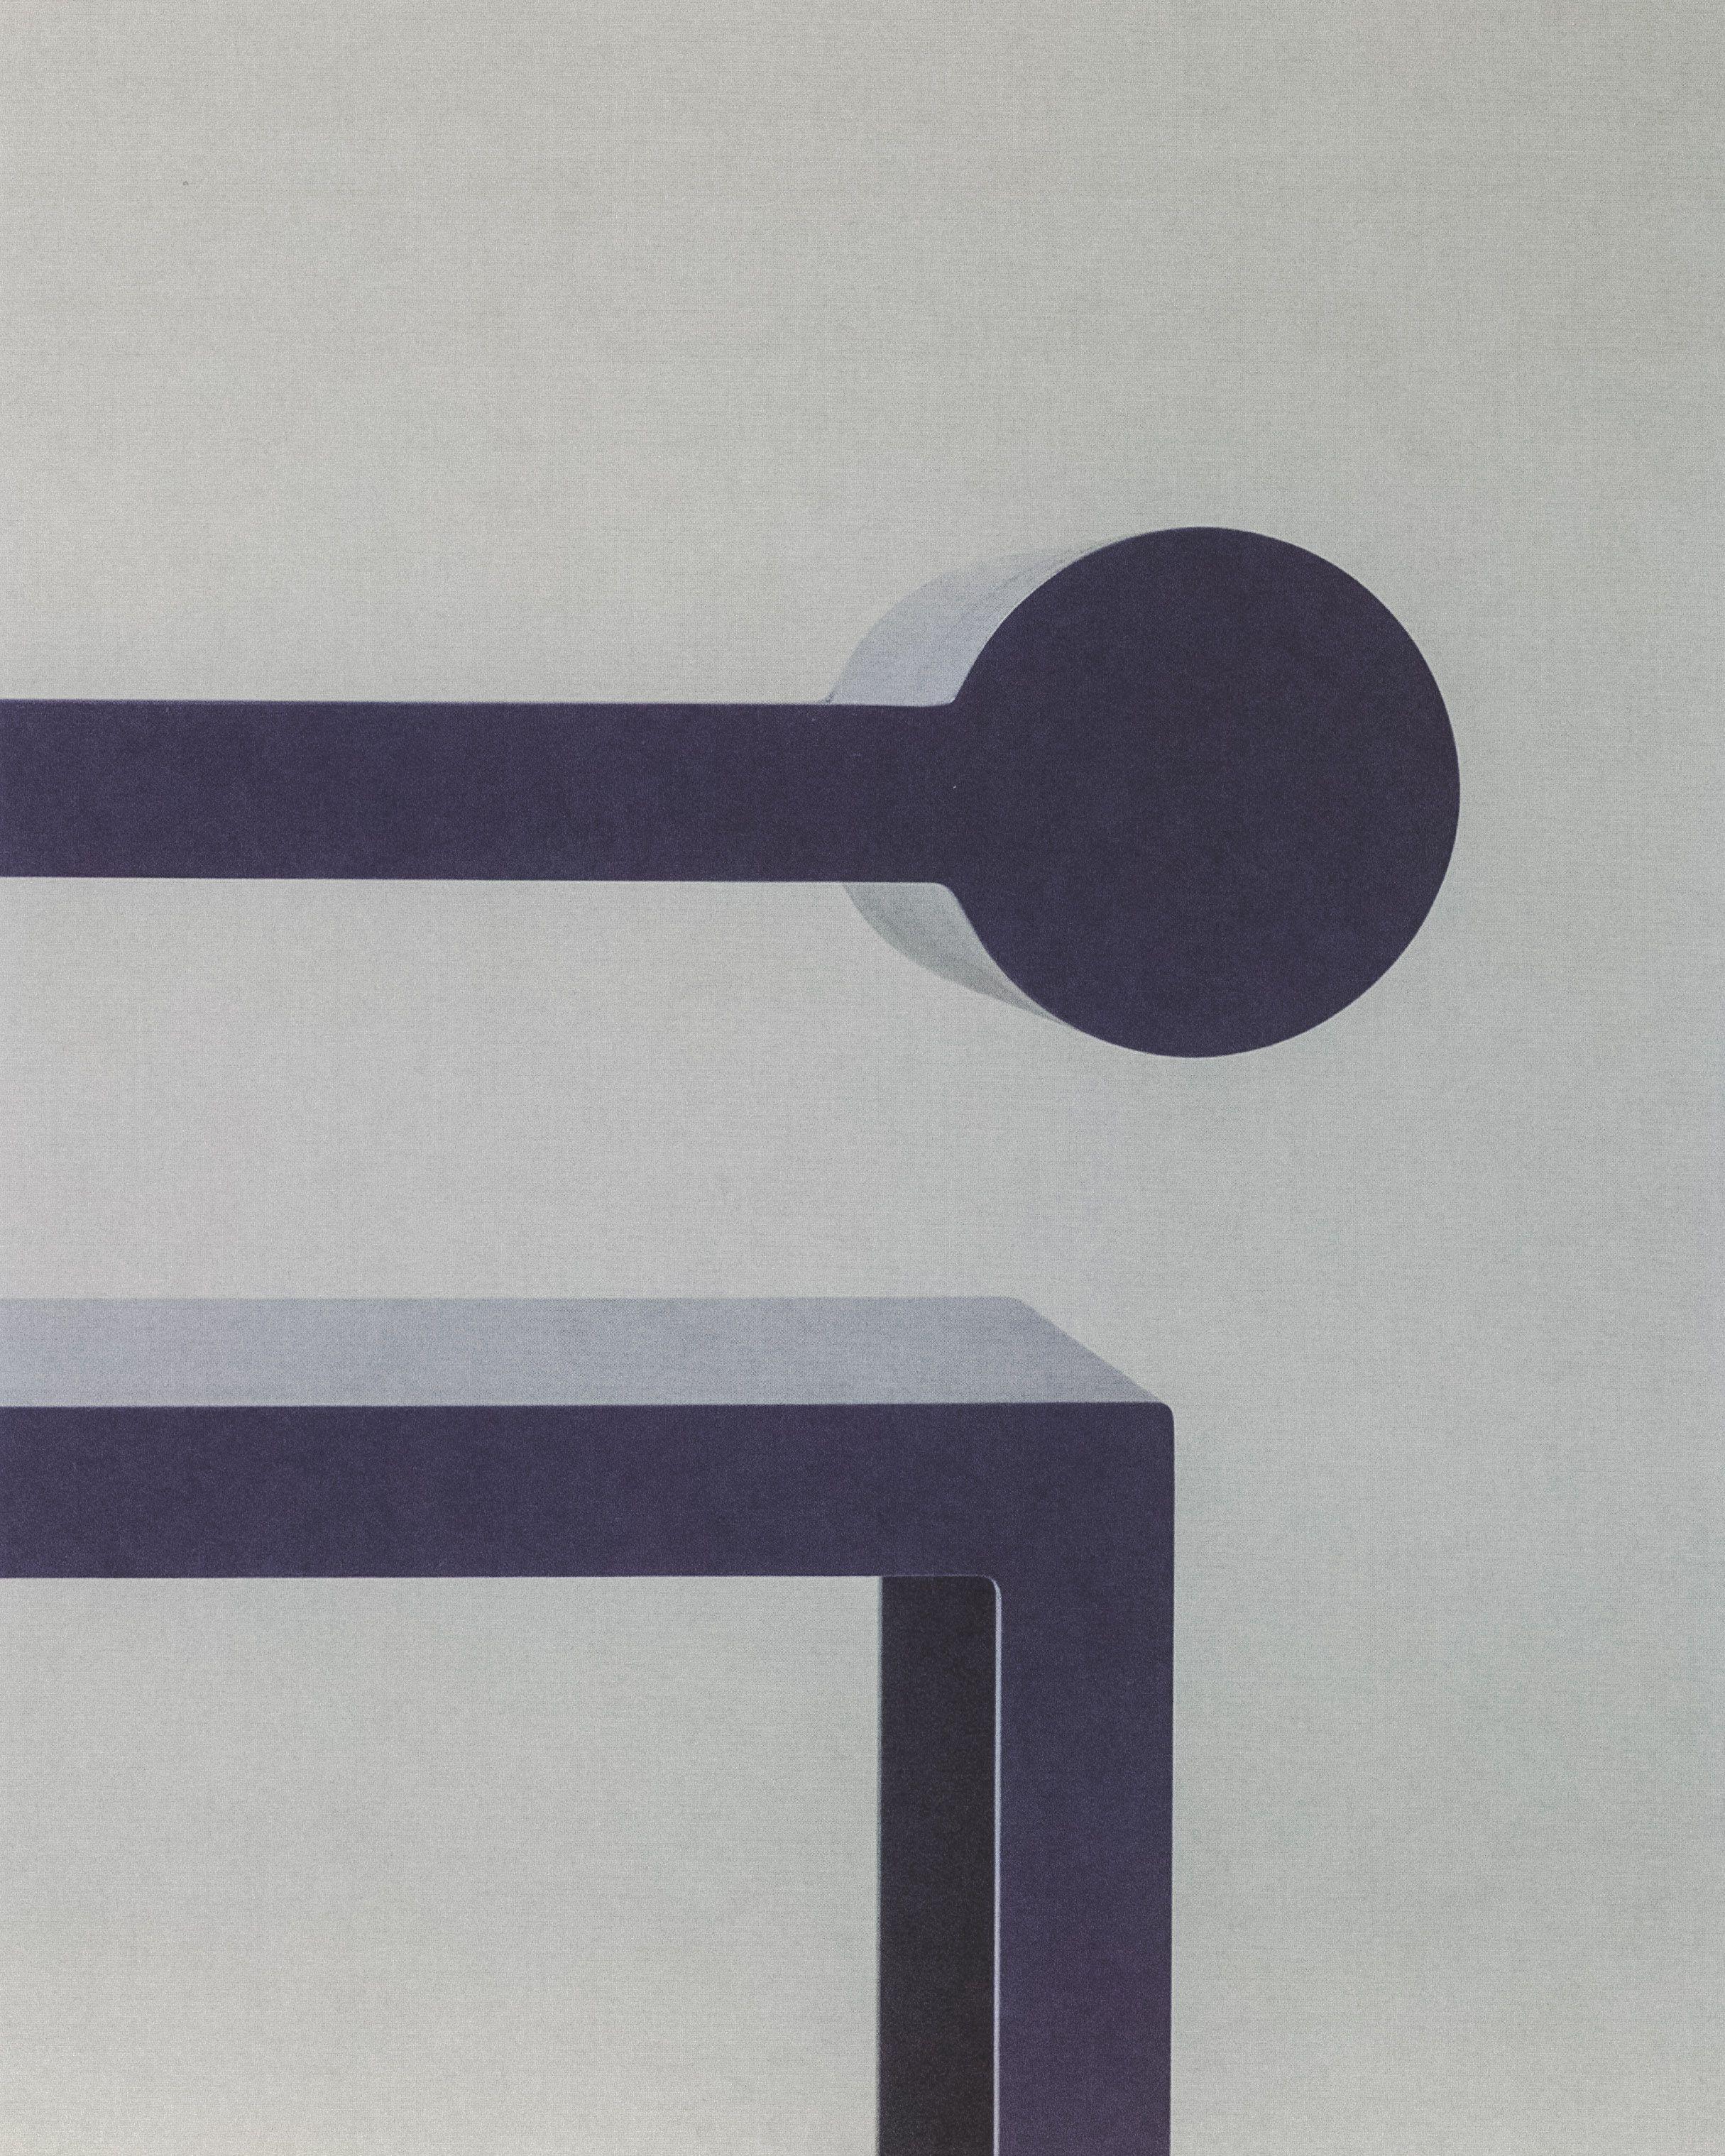 Purple Cylinder Back Arm product image 2